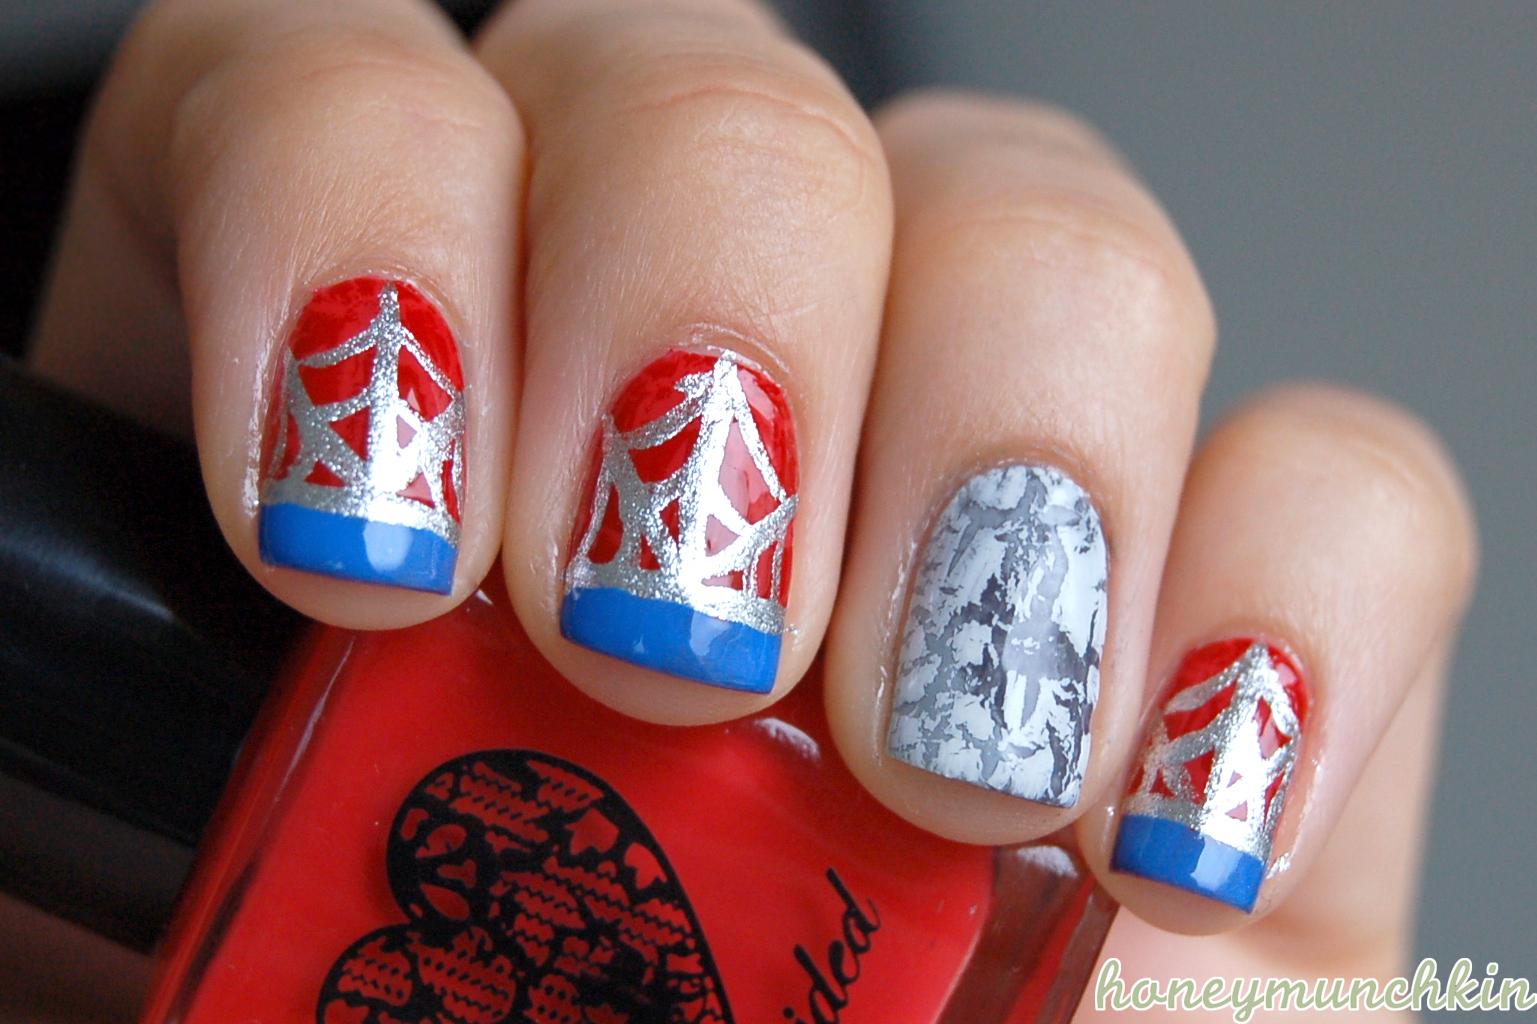 Nail Art Ideas » Marvel Nail Art - Pictures of Nail Art Design Ideas